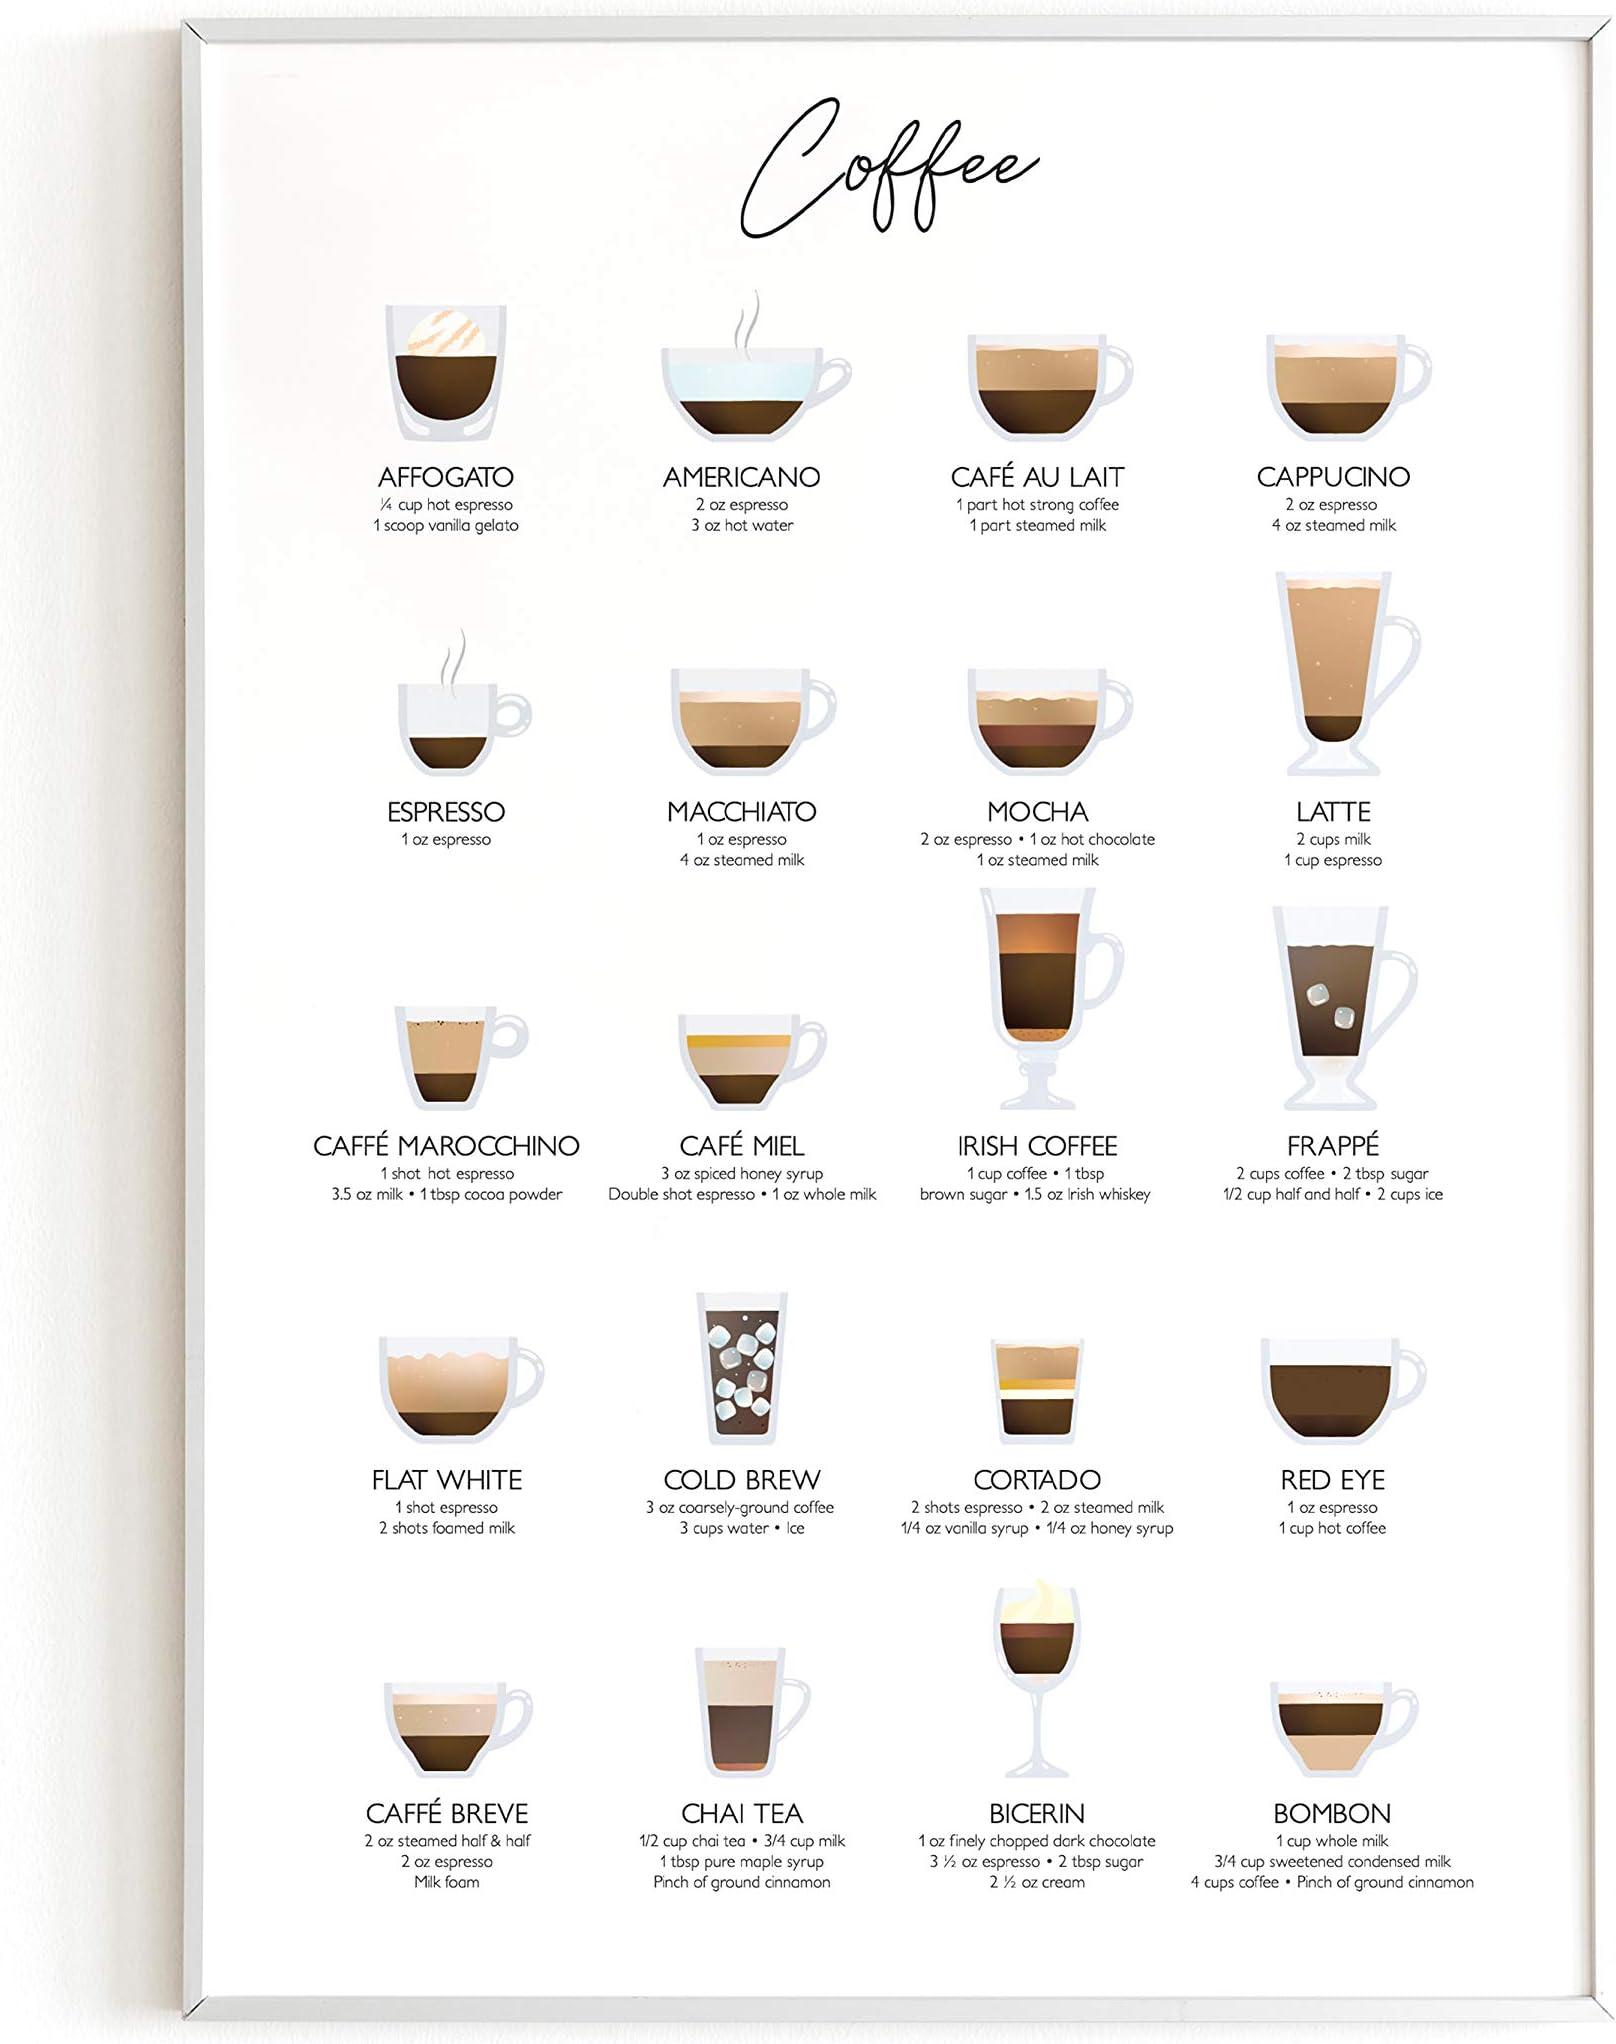 Coffee print house print interior design print funny coffee print kitchen print